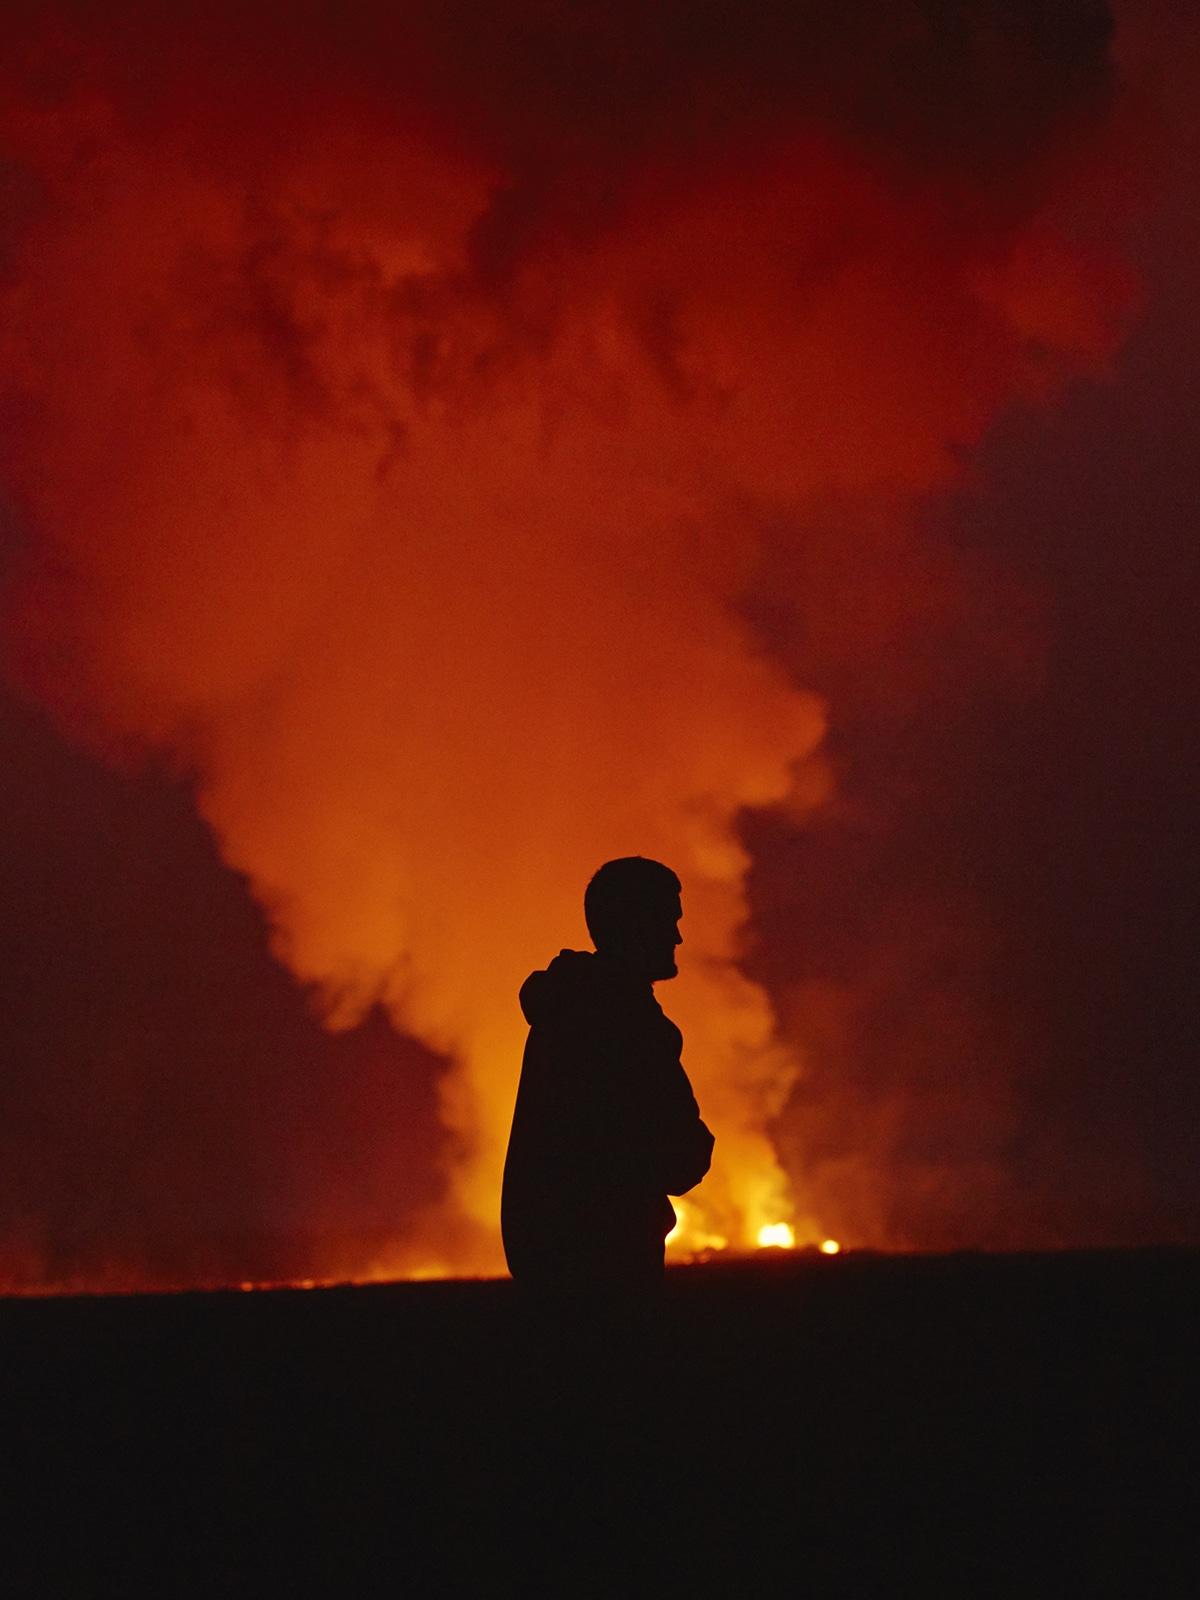 perierga.gr - Φωτογράφος απαθανάτισε την μακρύτερη σε διάρκεια έκρηξη ηφαιστείου